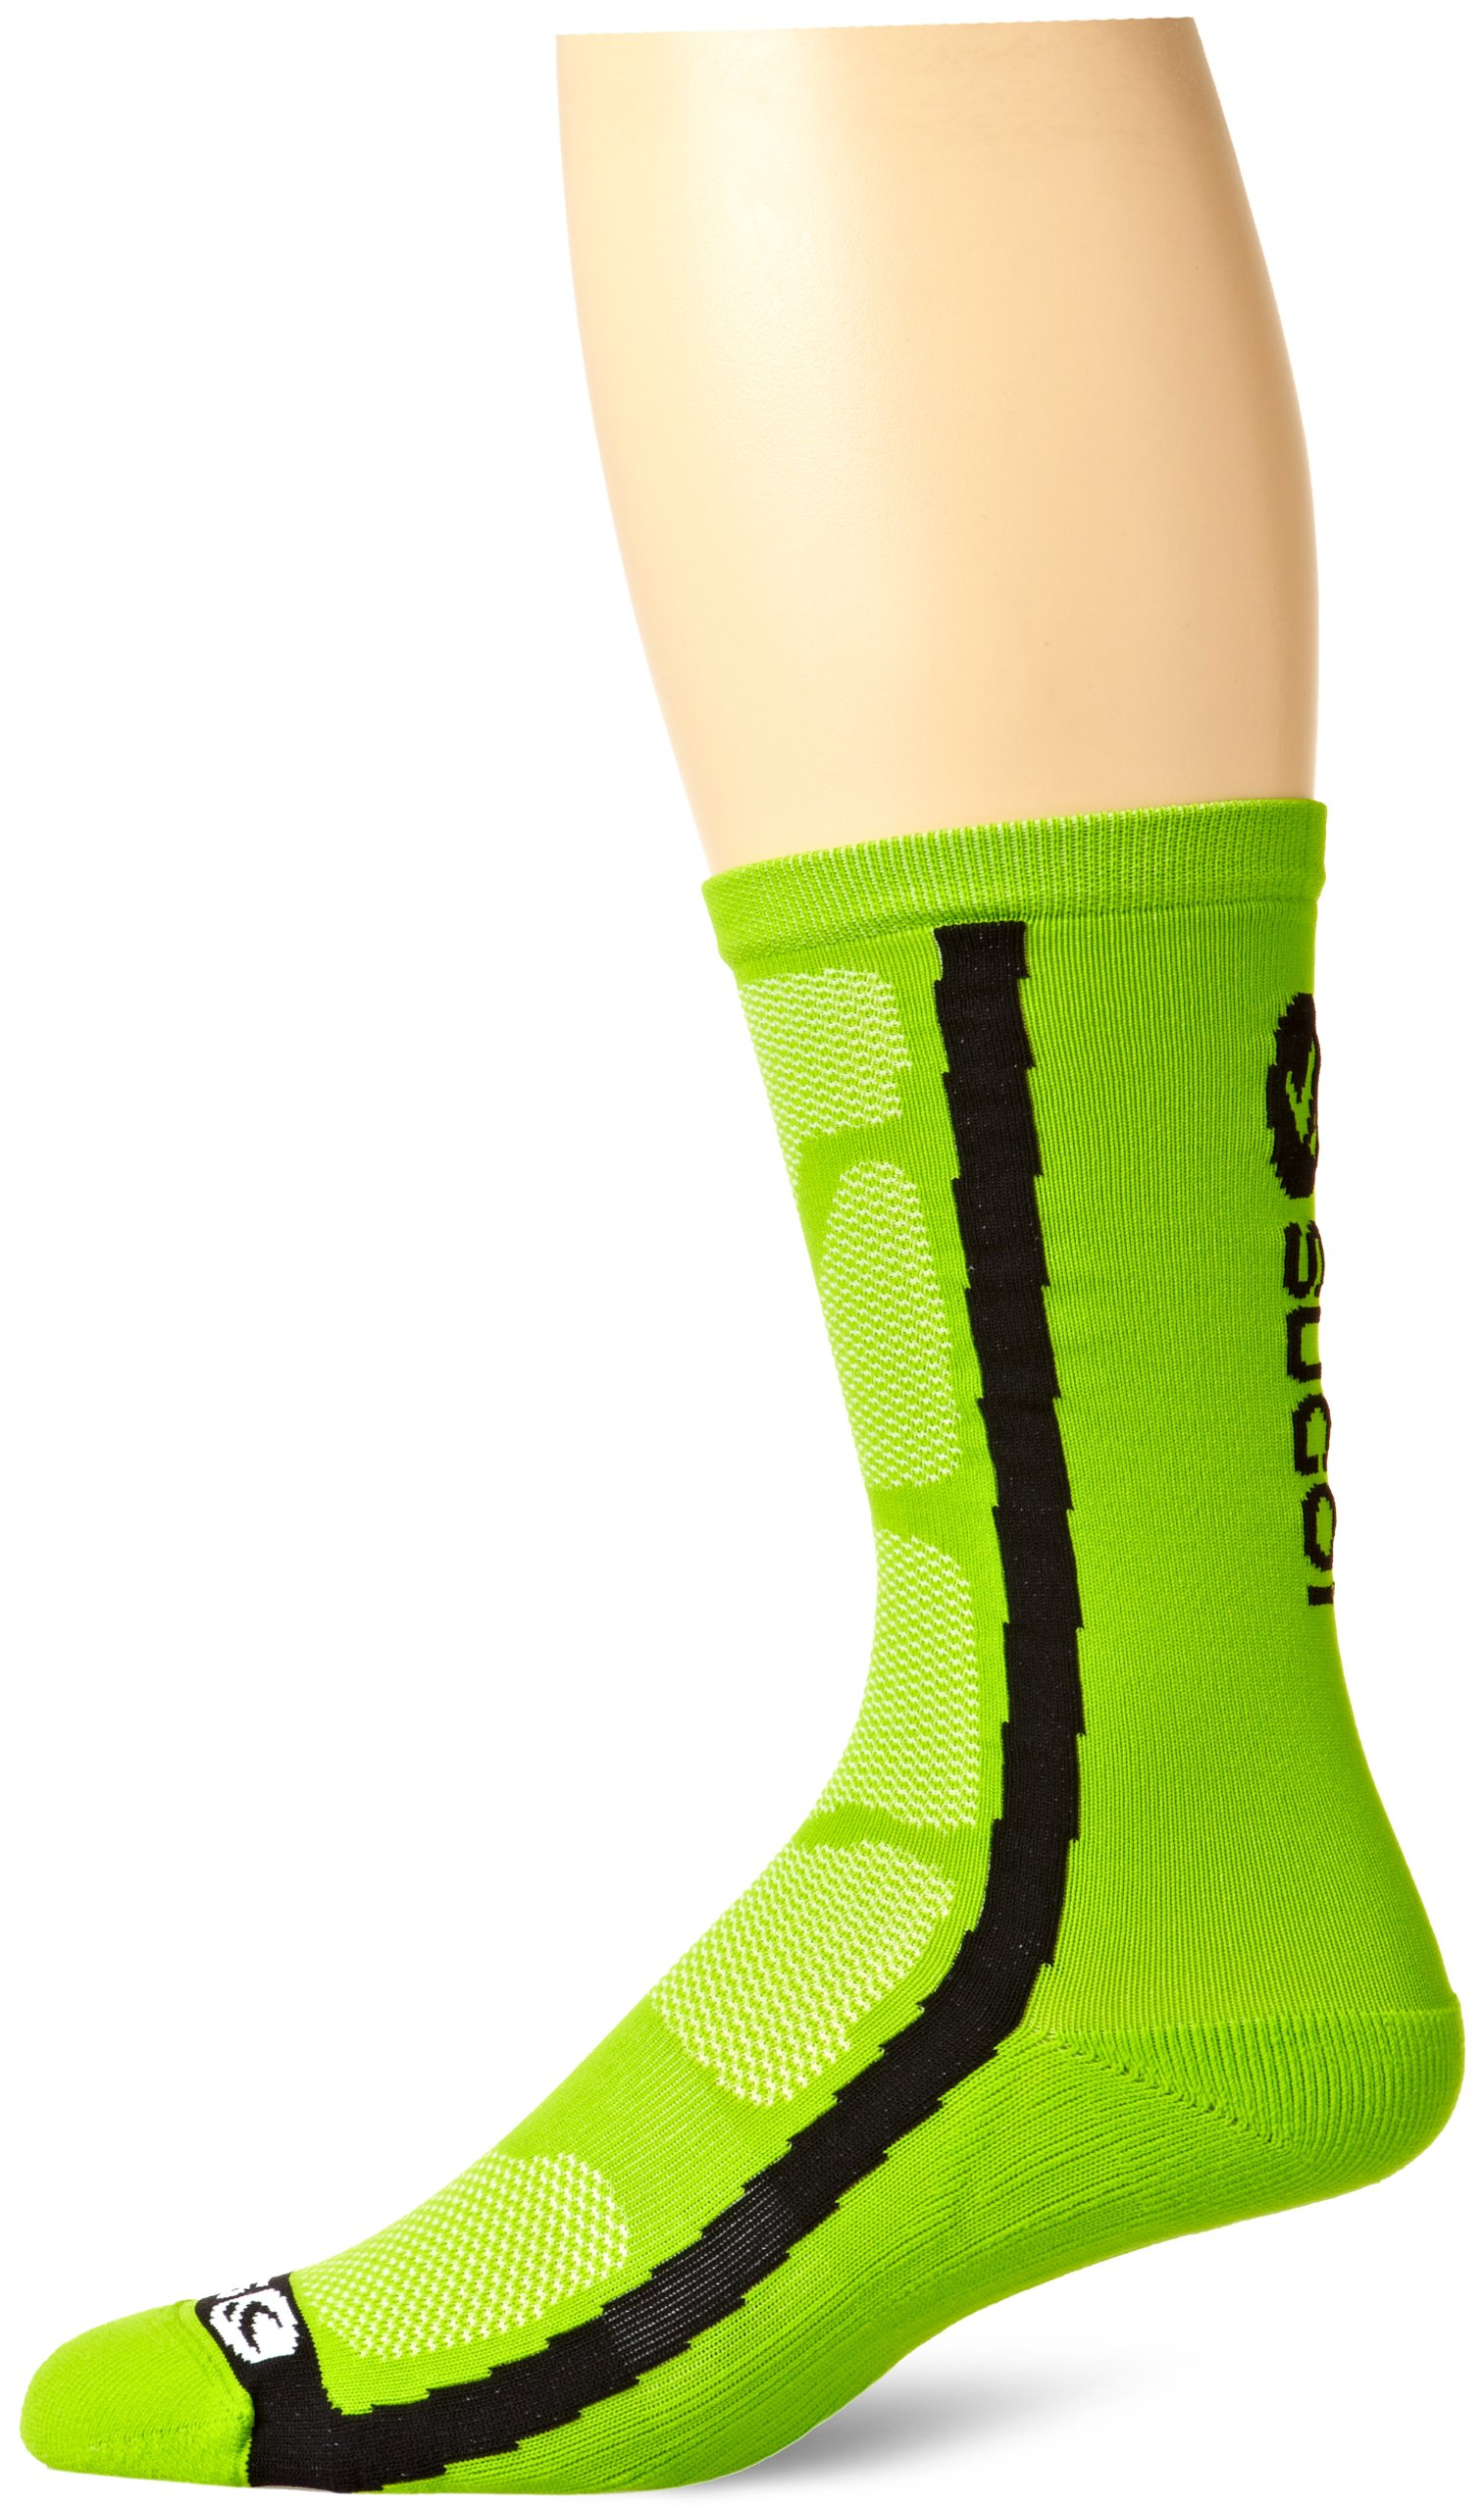 Sugoi RS Crew Socks, Lotus, Small by SUGOi